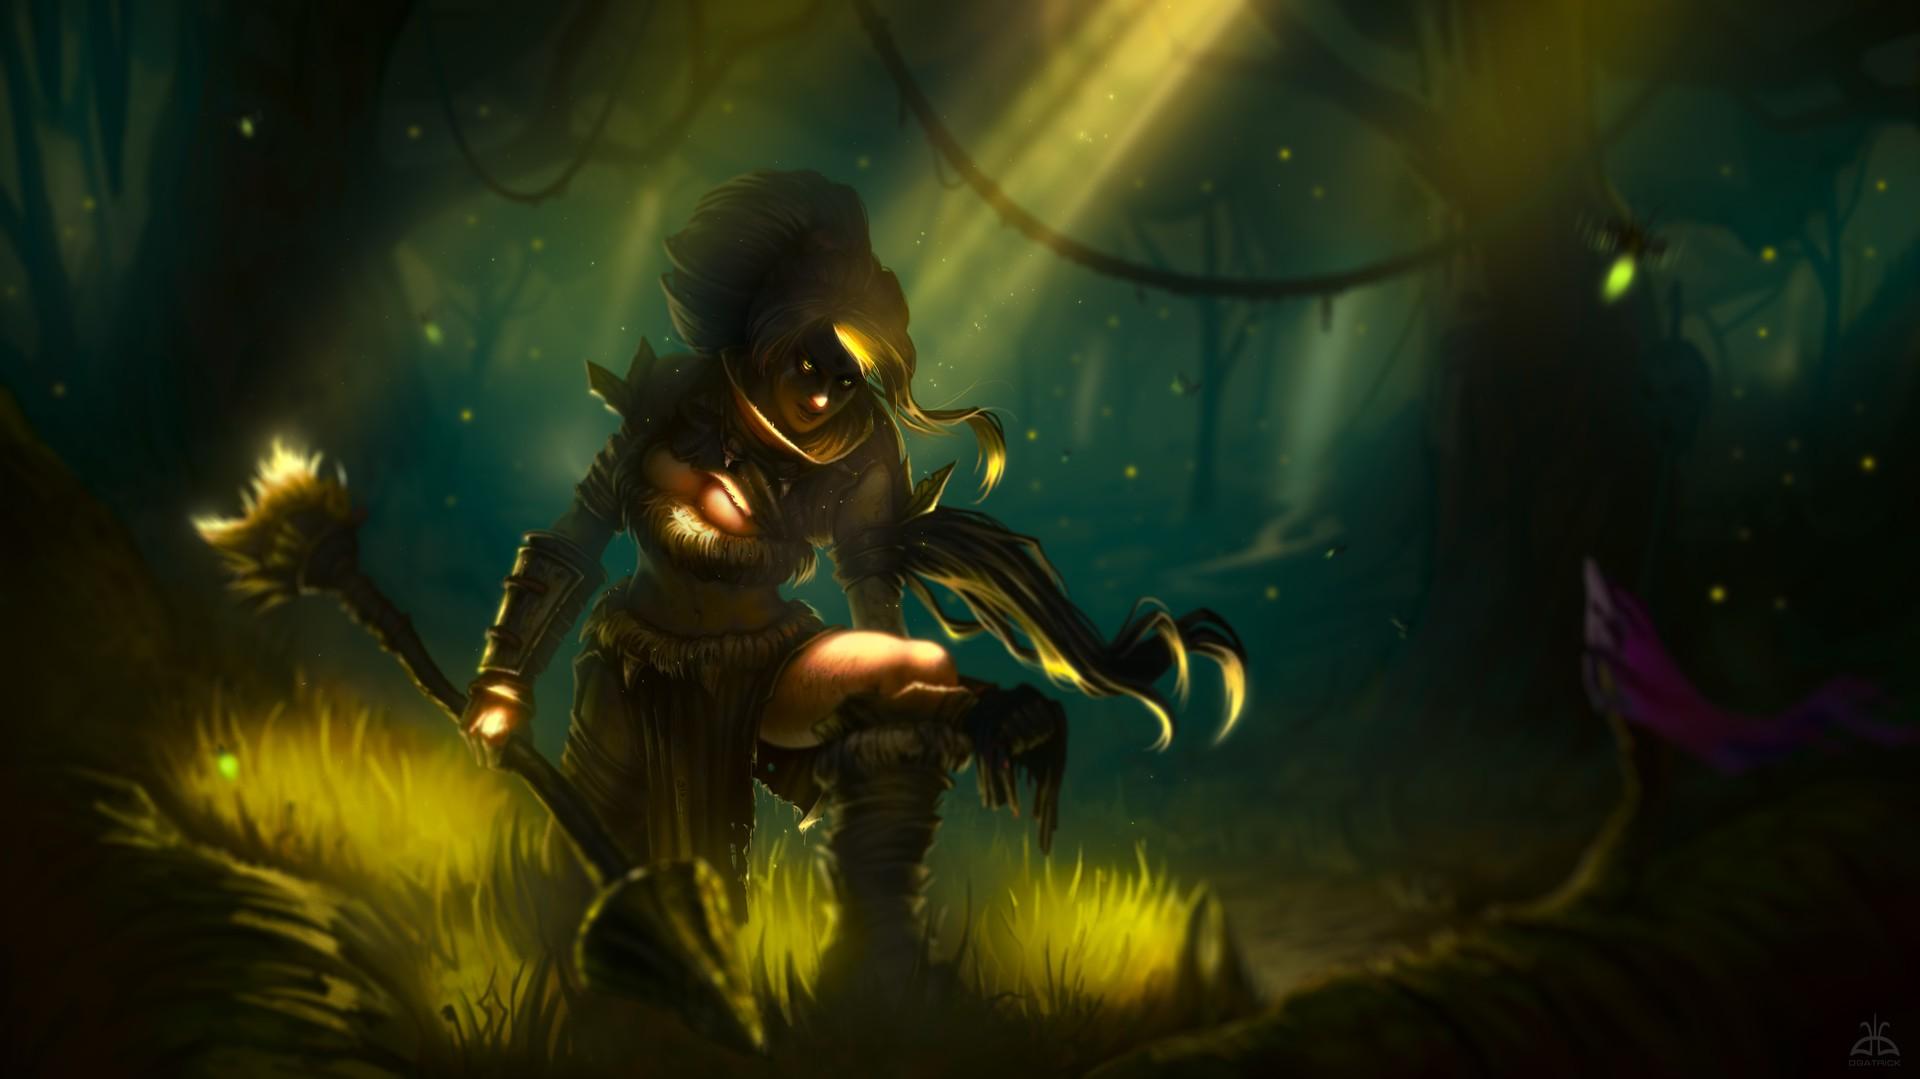 General 1920x1079 League of Legends Nidalee (League of Legends) PC gaming dark fantasy art fantasy girl